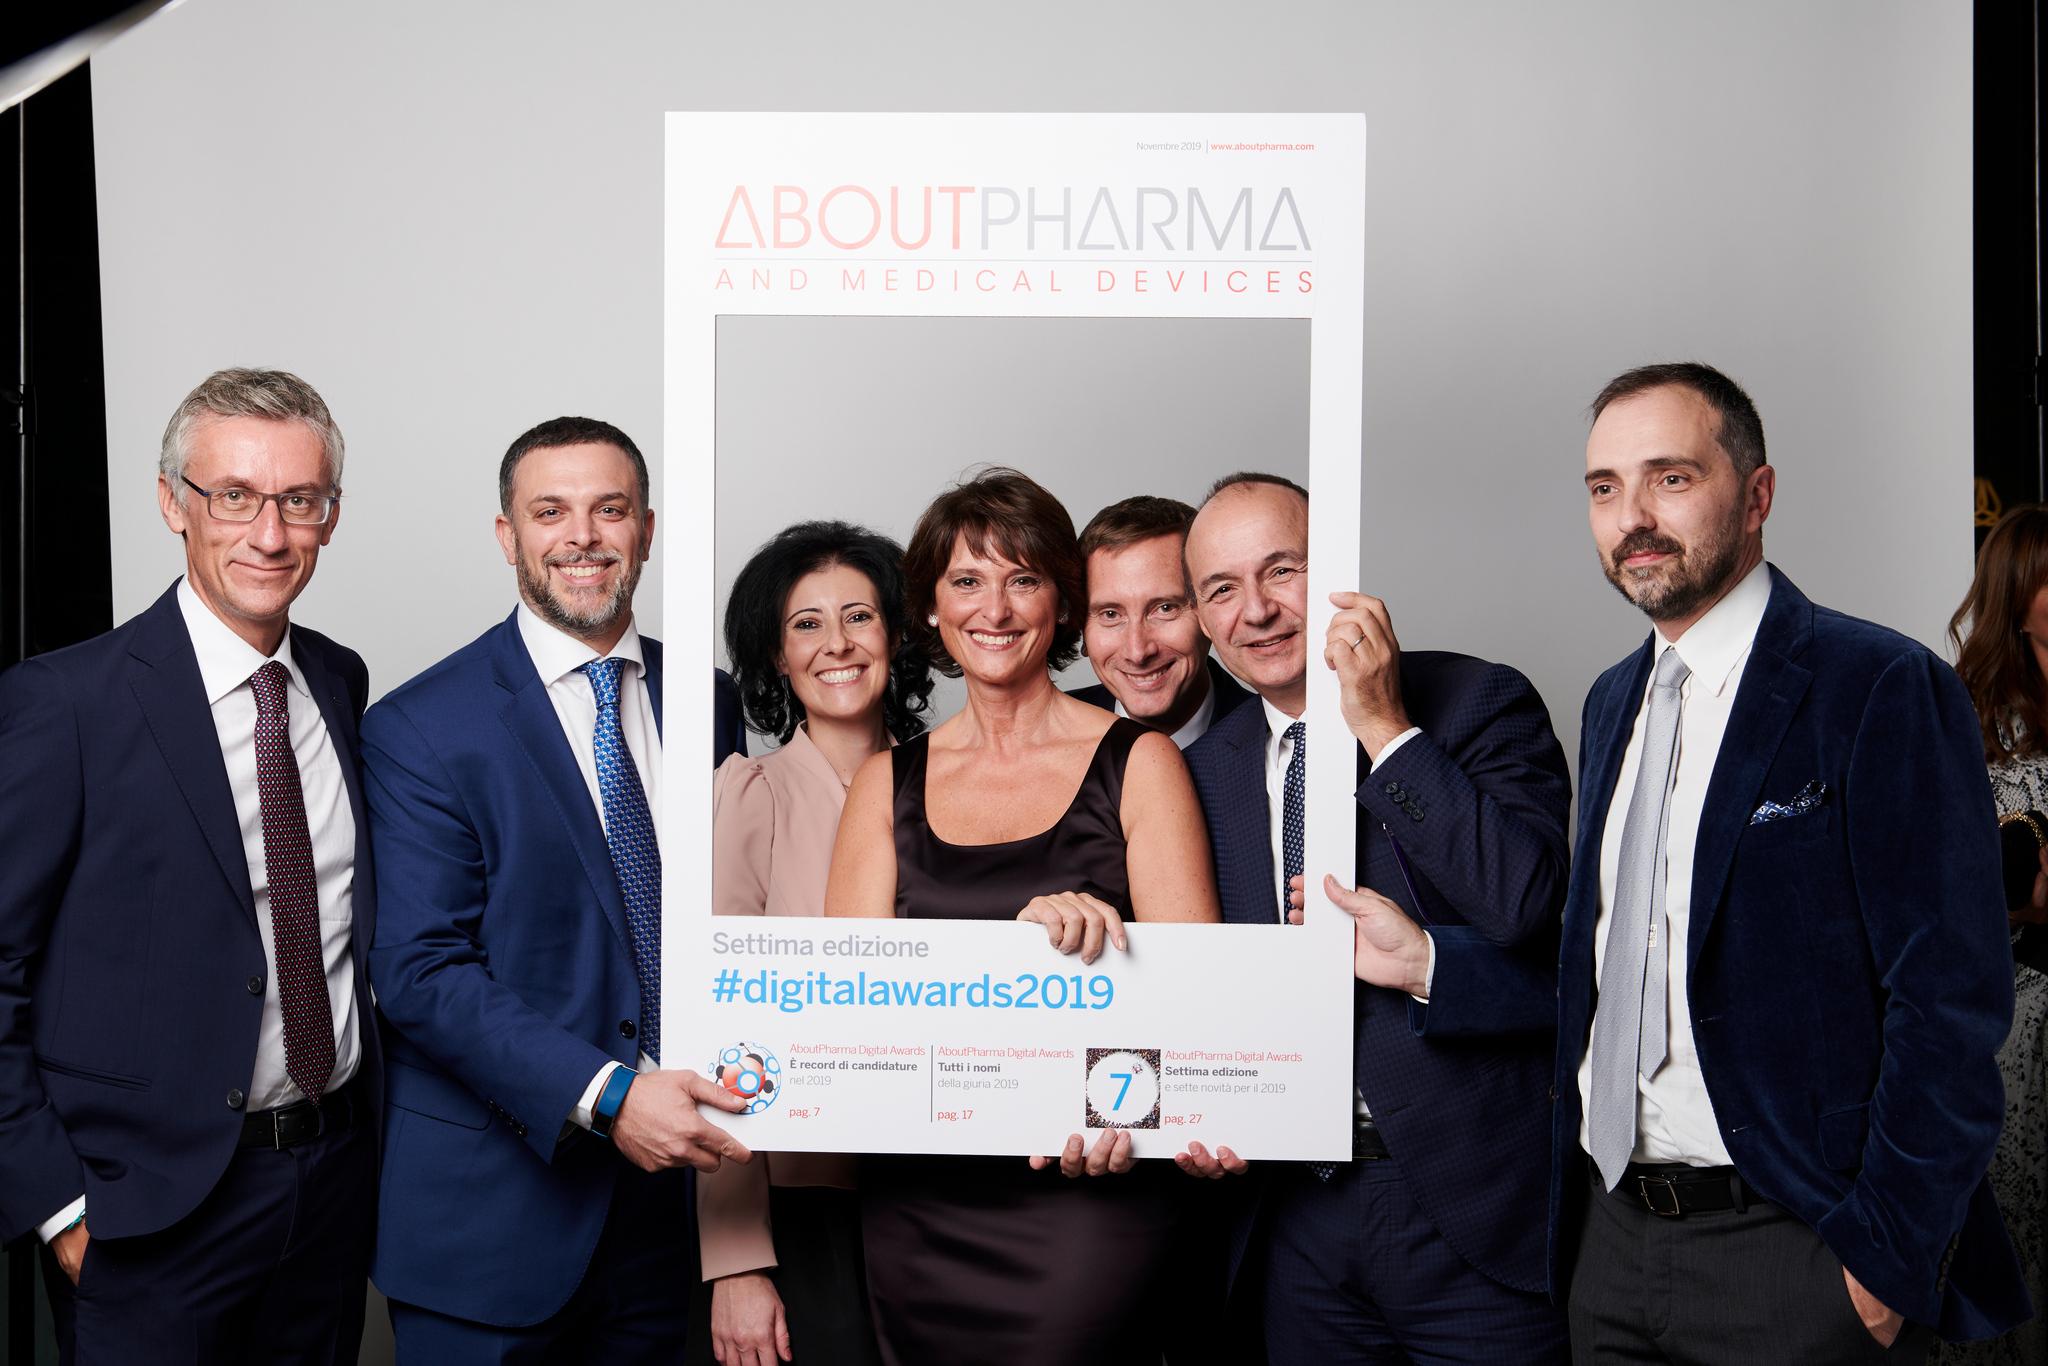 Photobooth AboutPharma Digital Awards 2019_37